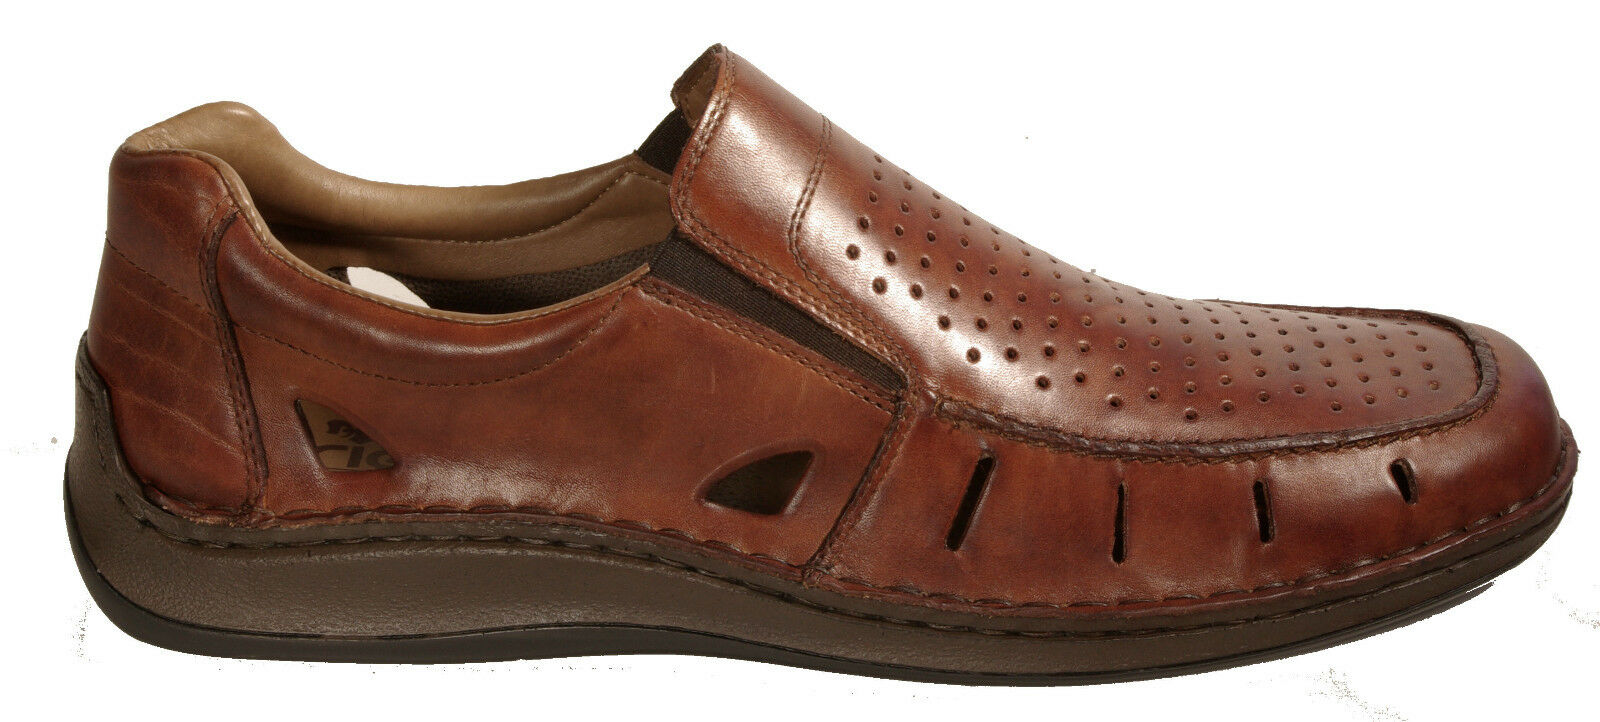 Rieker Chaussures basses été slipper marron en cuir véritable extra grand NEUF